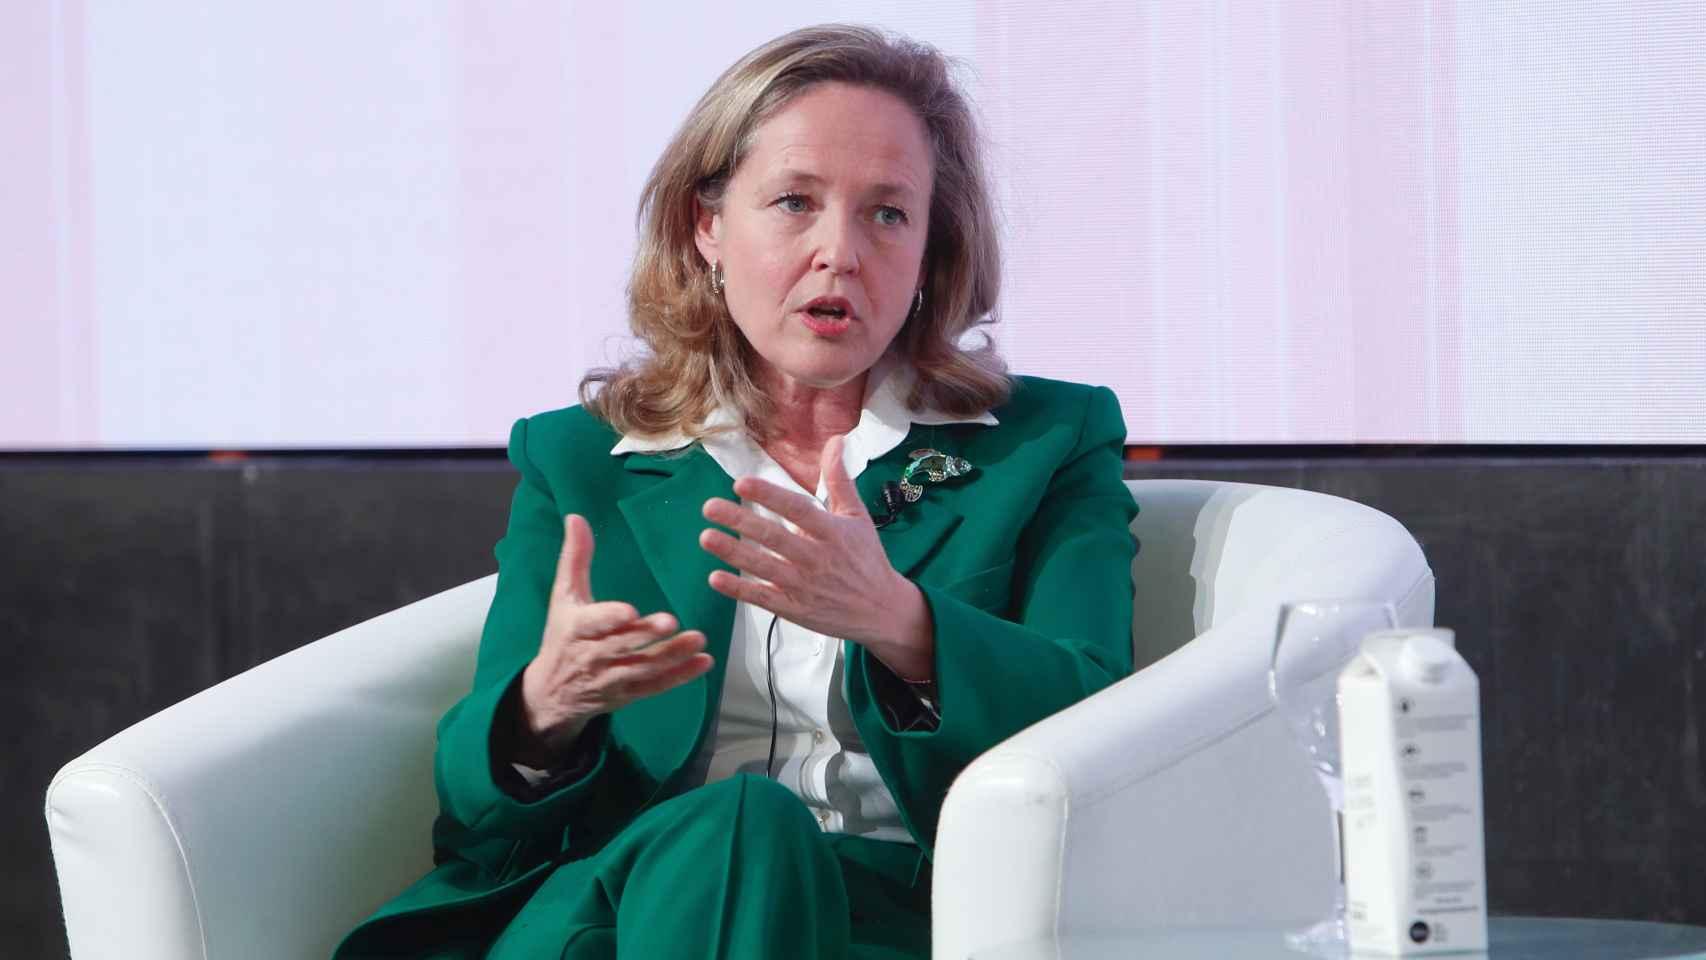 La vicepresidenta económica, Nadia Calviño, en Wake up, Spain!